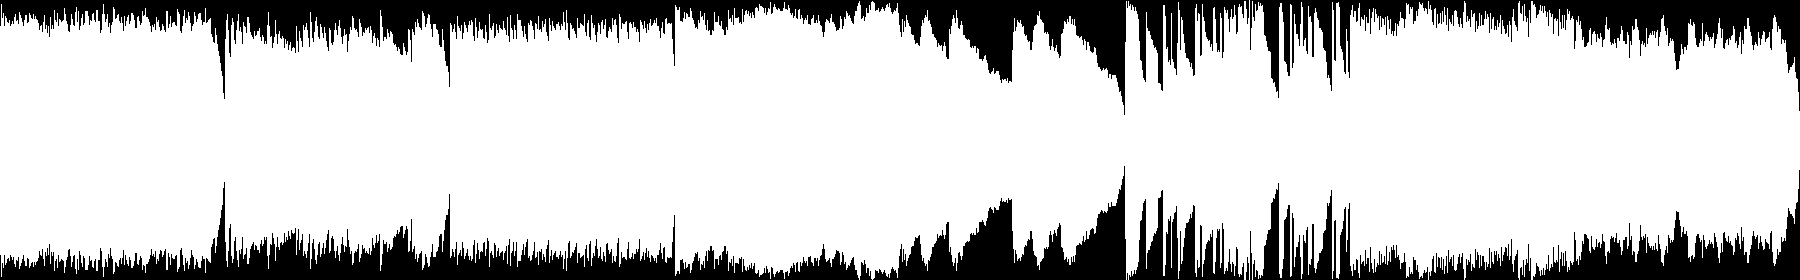 OMNISPHERE BUNDLE audio waveform